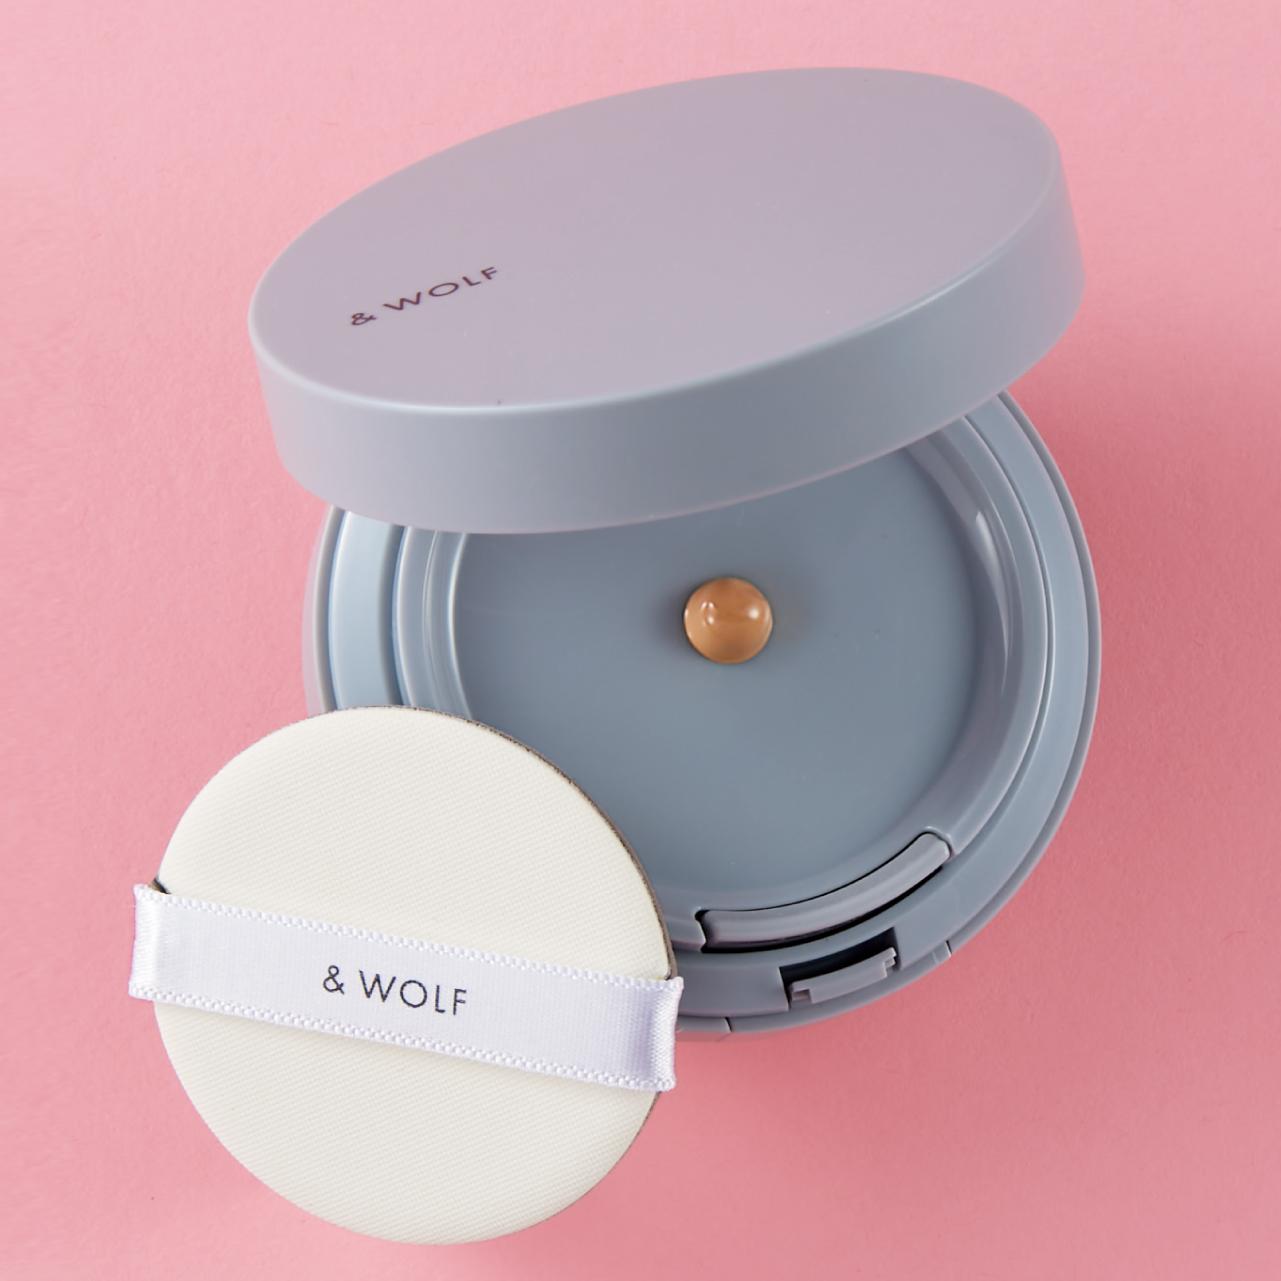 & WOLF セラムリキッドファンデーション 全3色 ¥4,180(リフィル¥3,080)/シロク